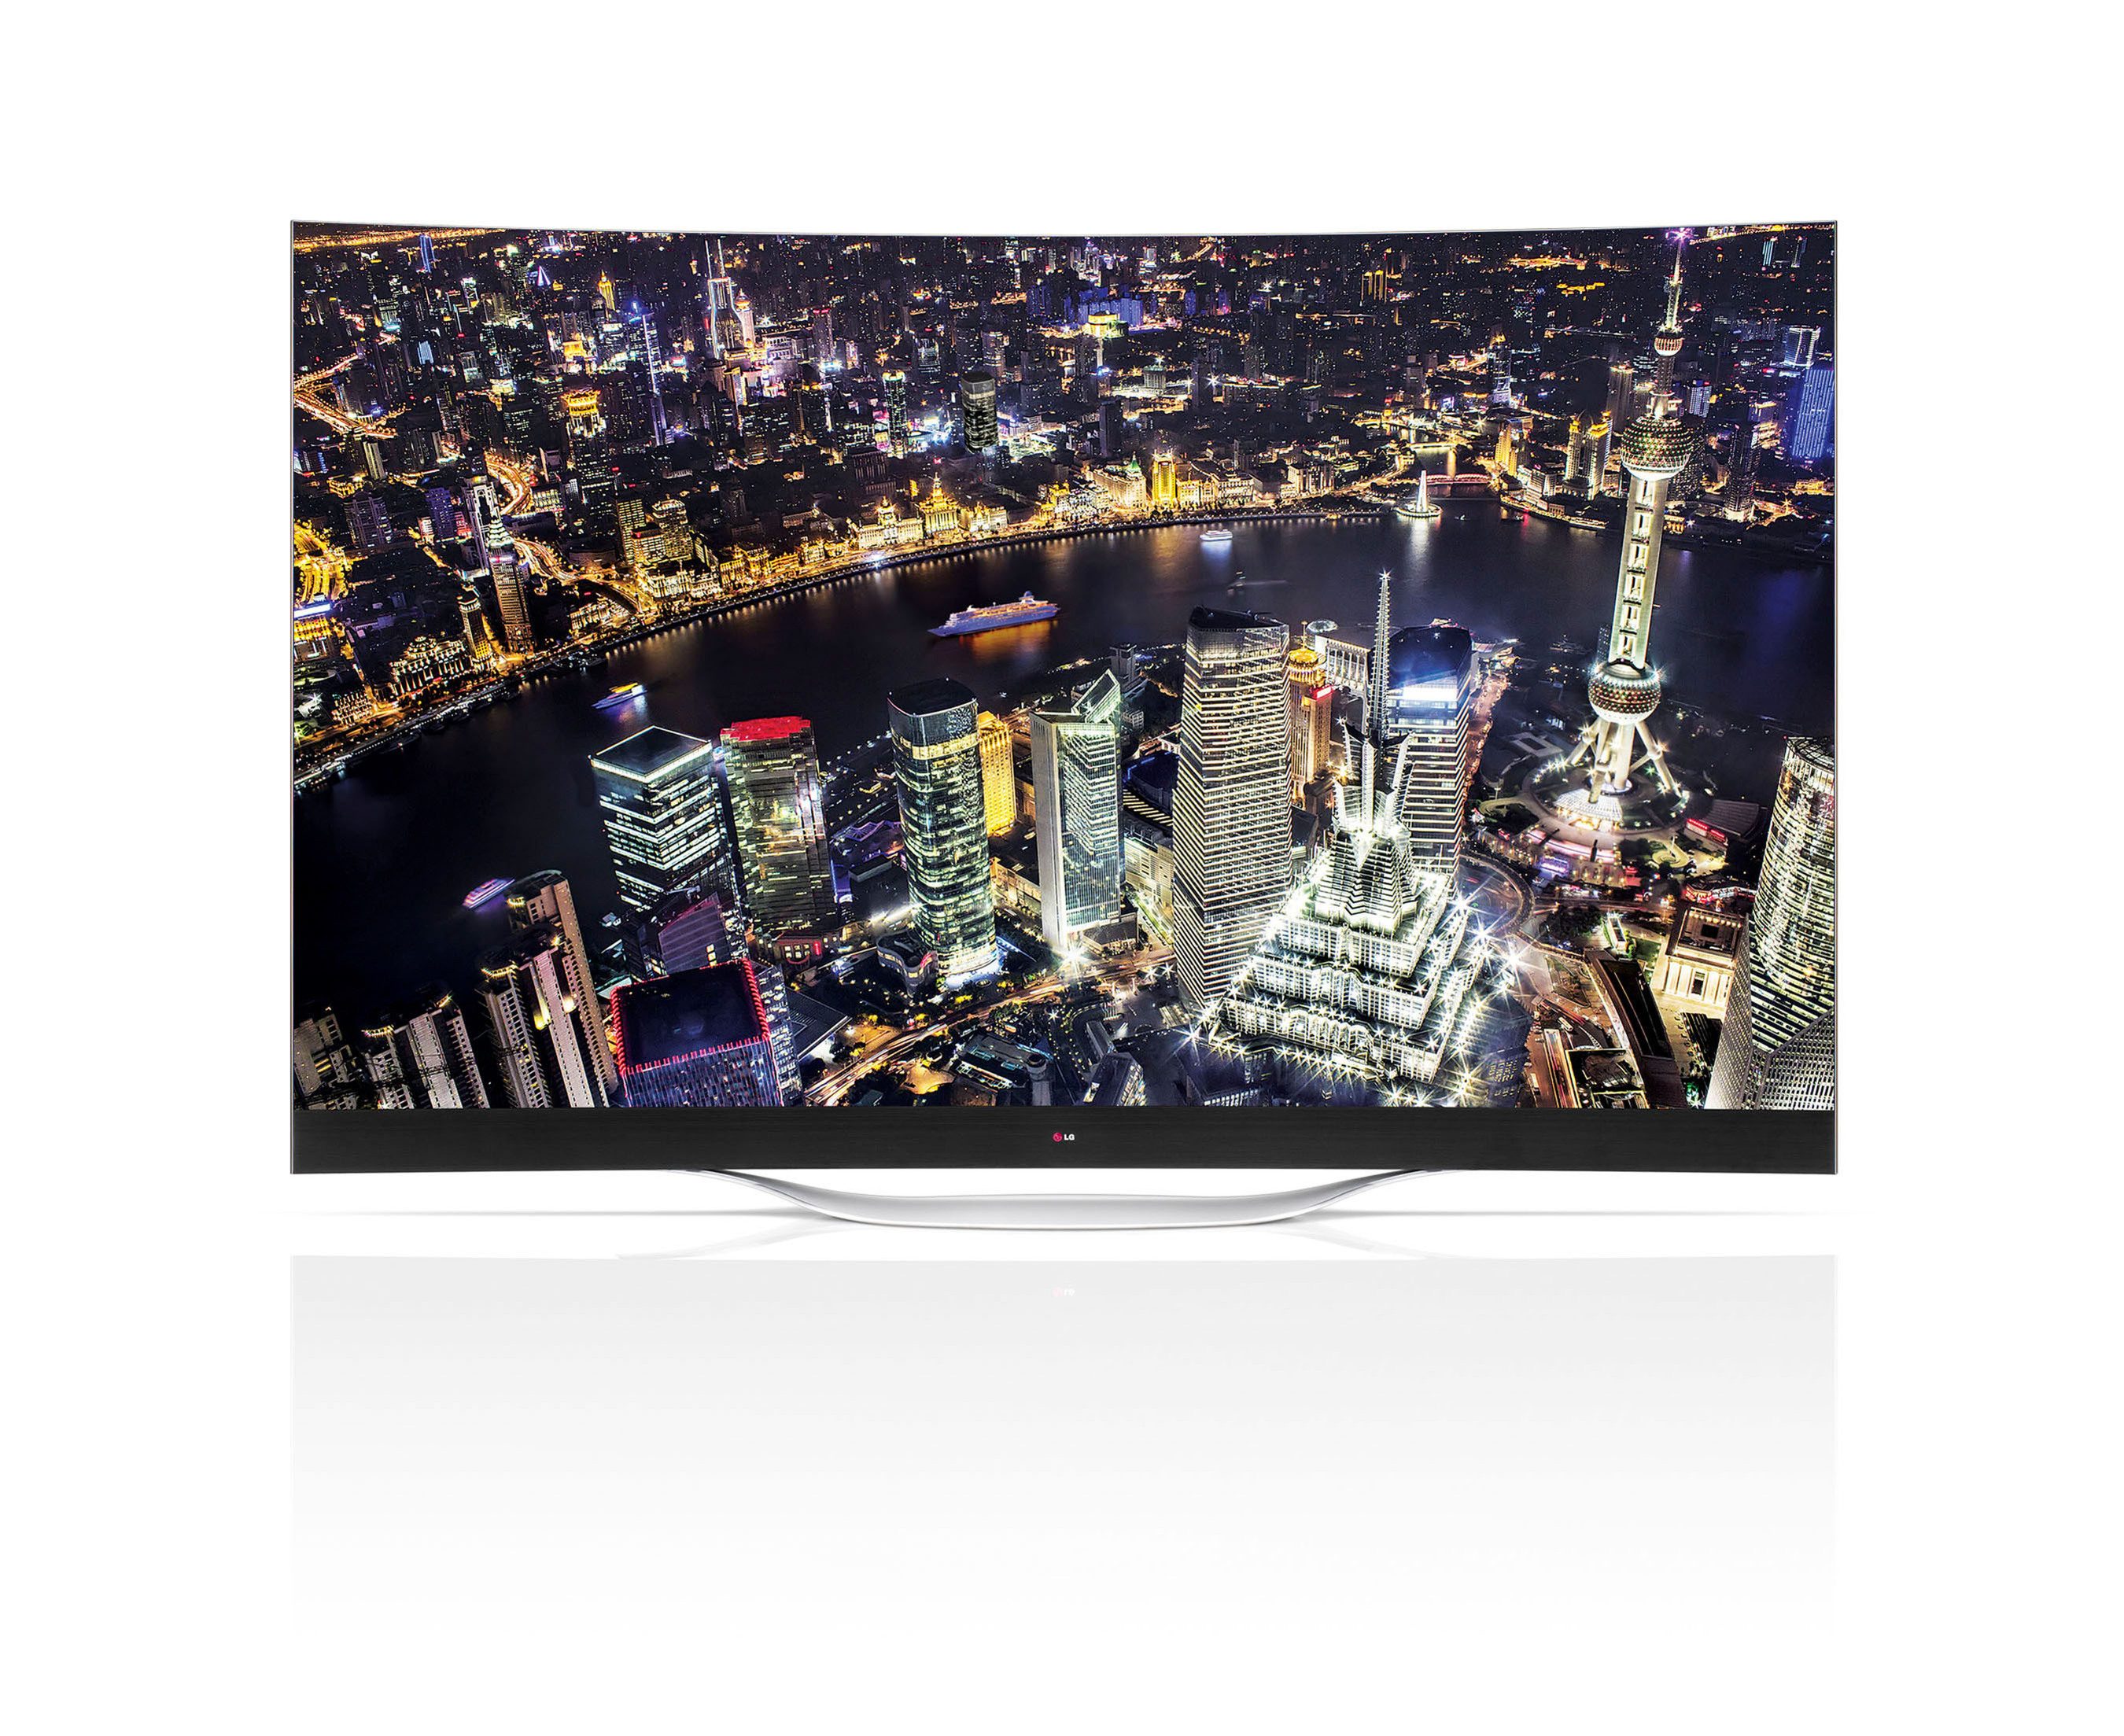 LG Electronics' new 77-inch class ULTRA HD CURVED OLED TV (model 77EC9800) will be on display at next week's 2014 International CES.(PRNewsFoto/LG Electronics USA, Inc.)